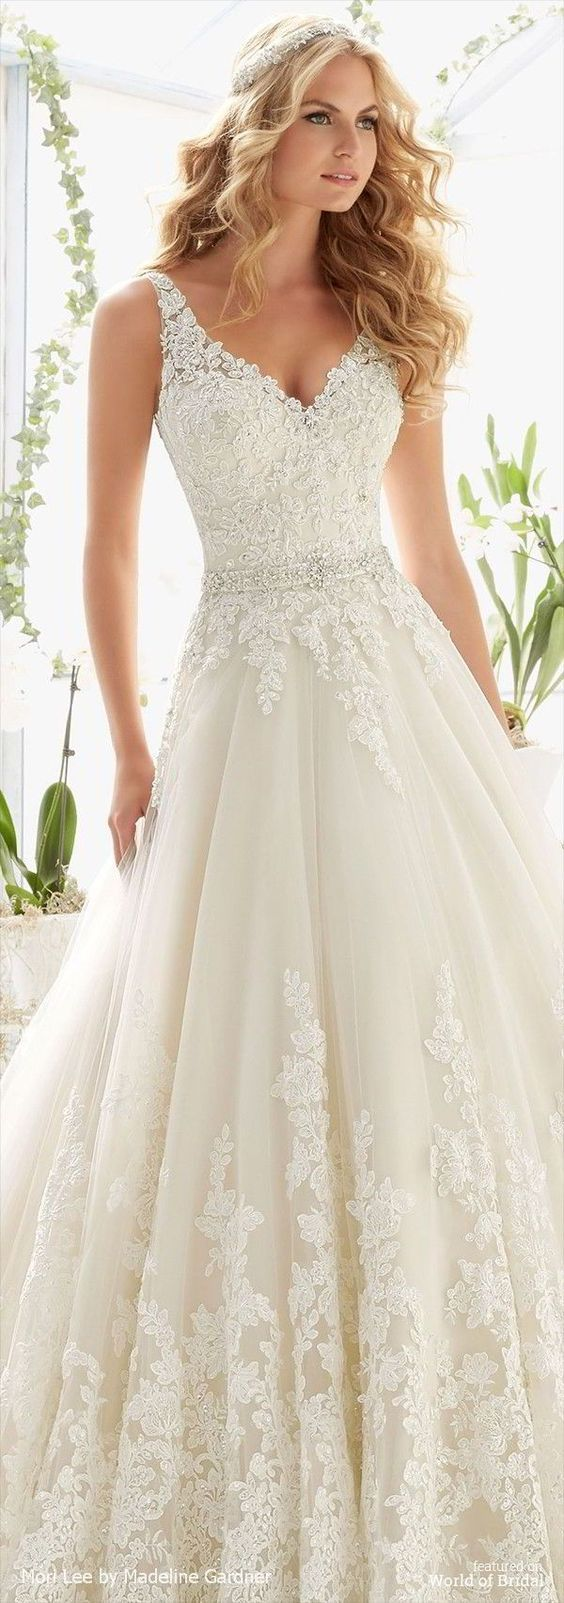 Simple White Country Wedding Dresses Lixnet Ag